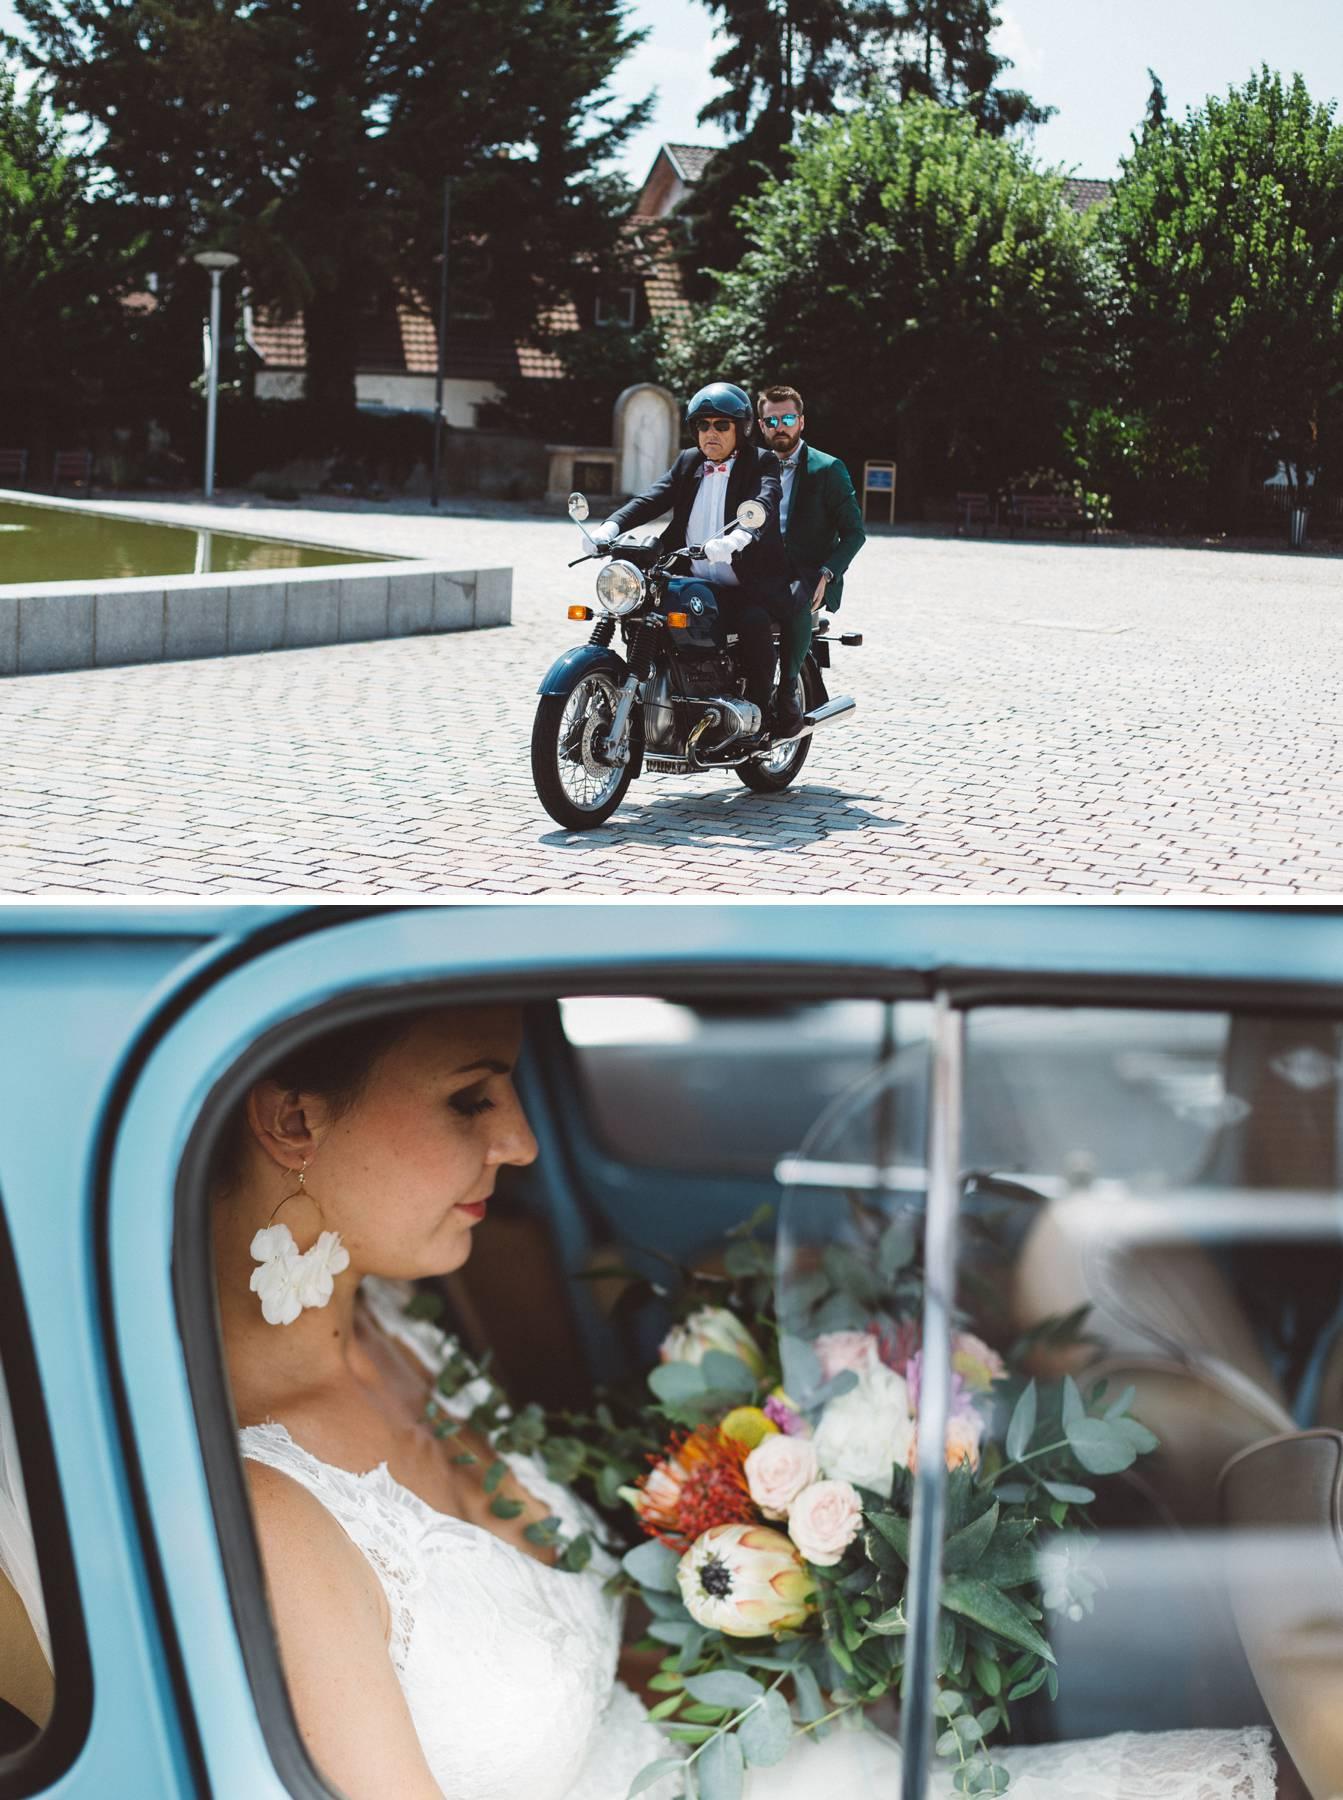 mariage-tropical-raben-horben_0004.jpg